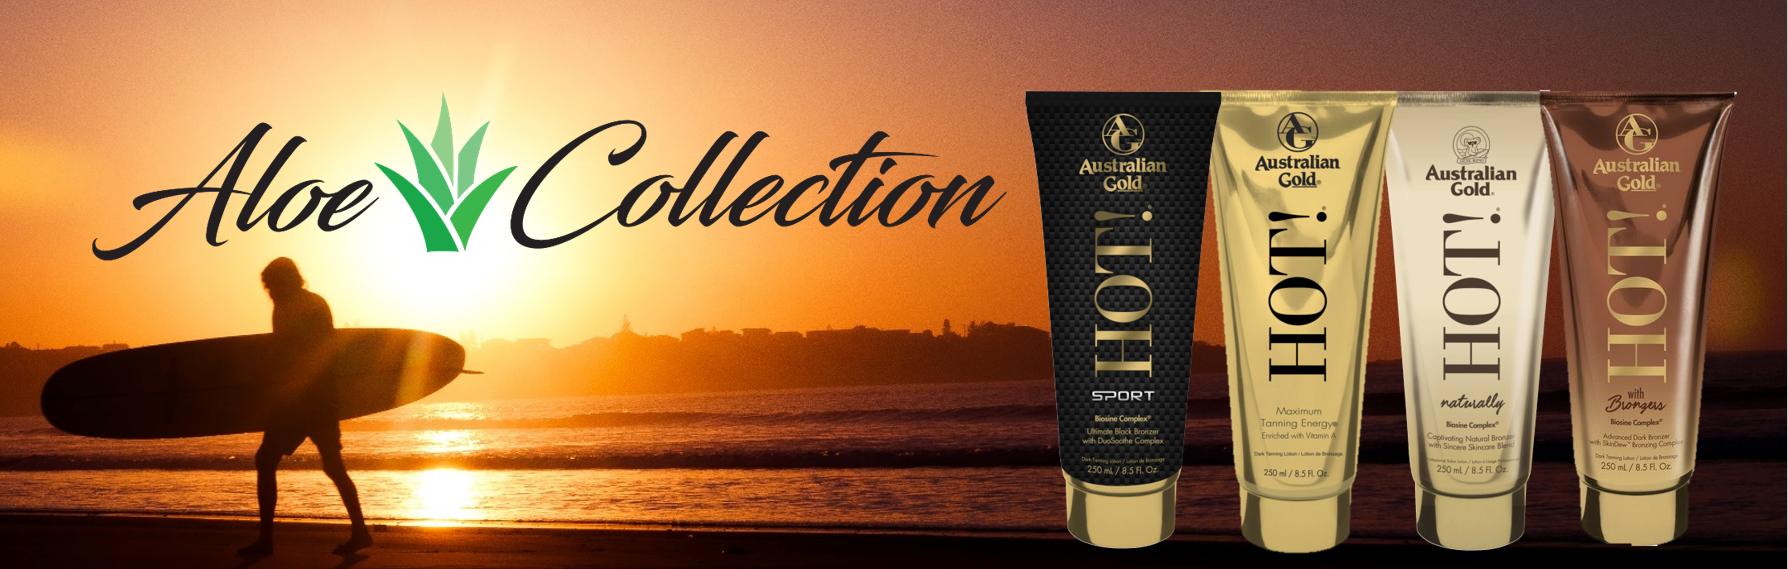 Australian Gold Sun Cream Tanning Accelerator